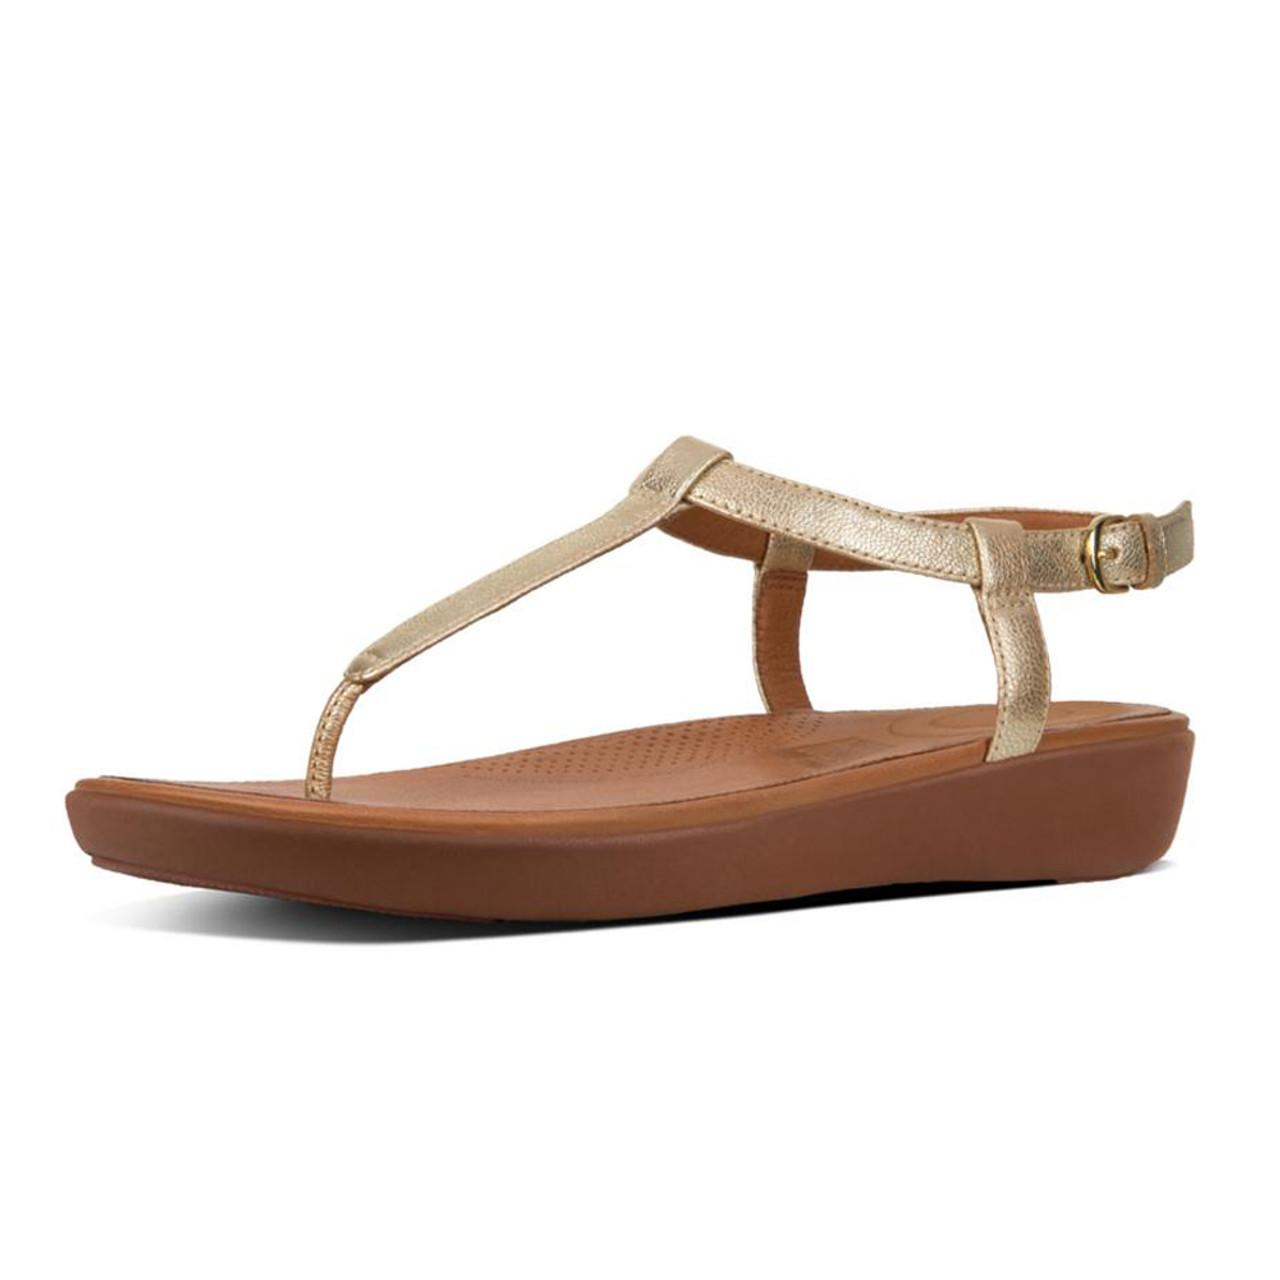 d3b77e112059 Fitflop Women s Tia Toe Thong Sandal Pale Gold - Shop now   Shoolu.com